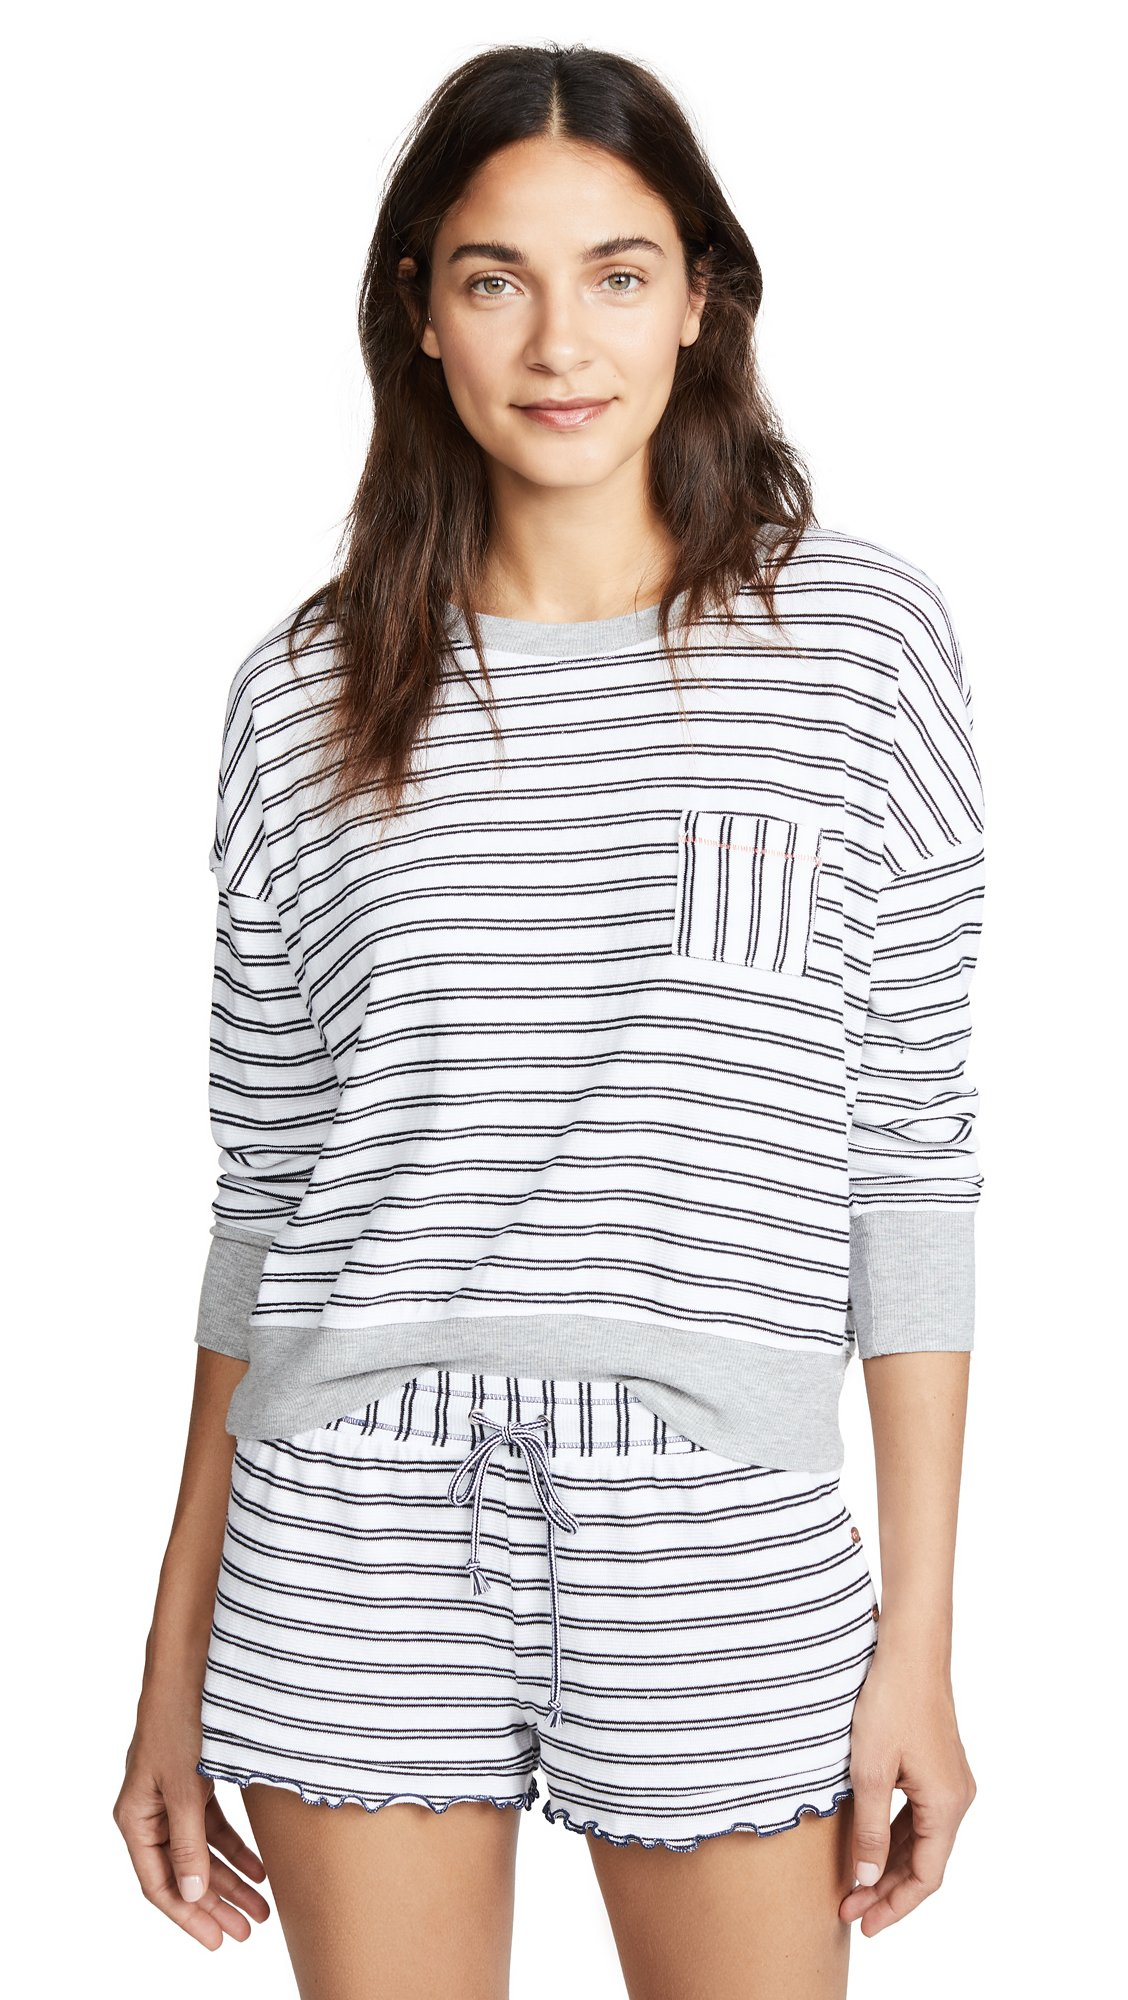 Splendid Women's PJ Shirt, Pacific Double Stripe, Medium